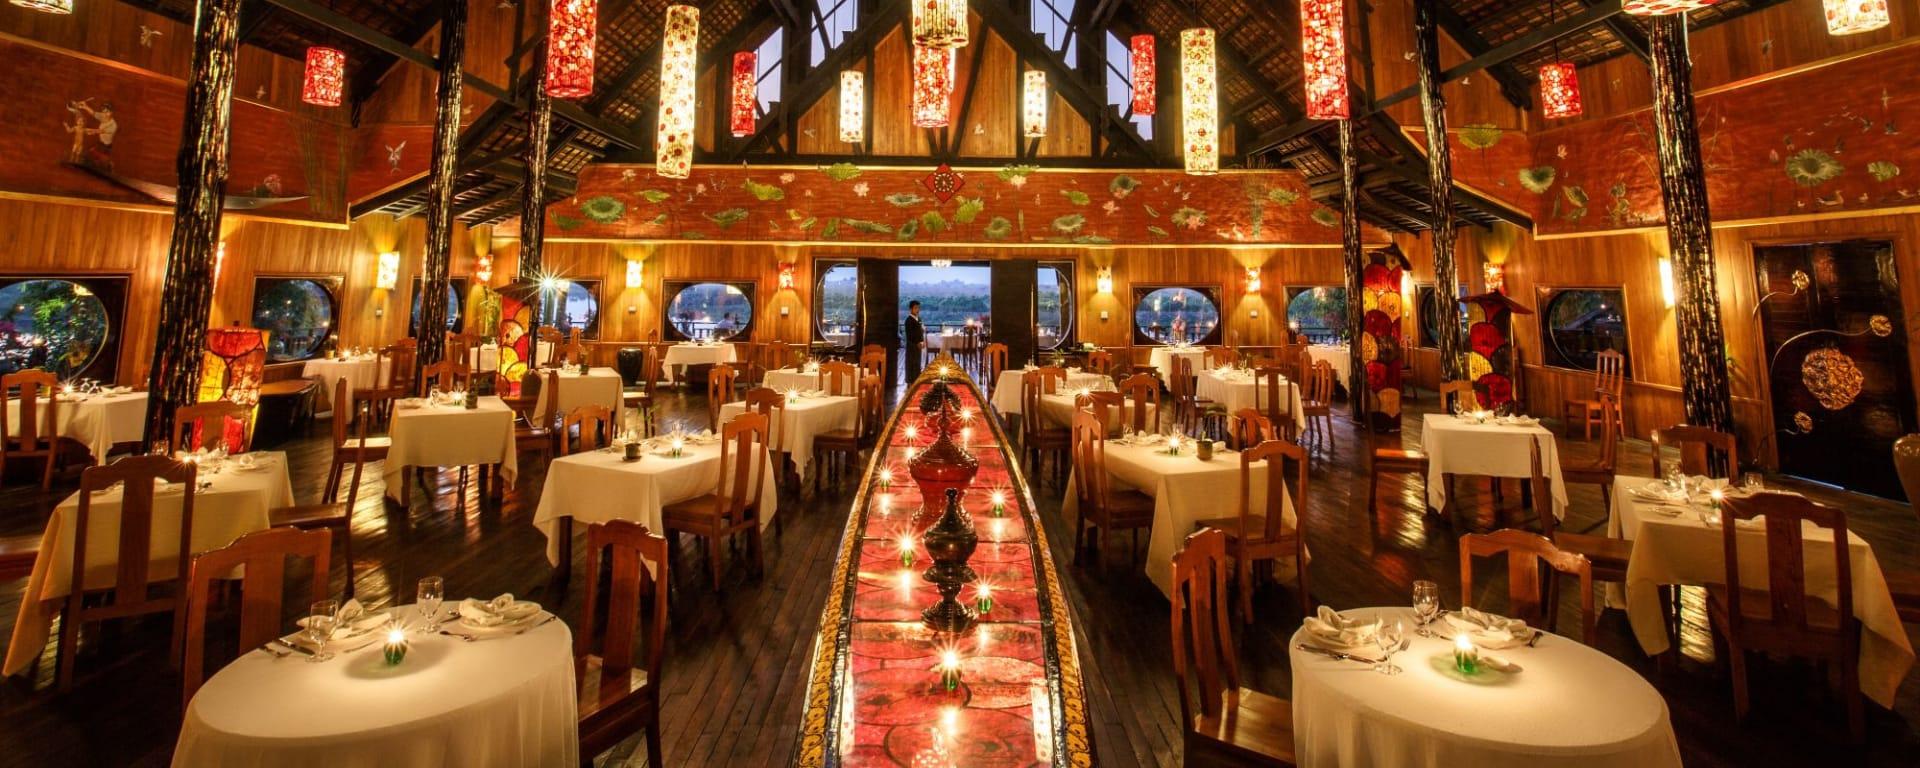 Inle Princess Resort in Inle Lake: Dining Room